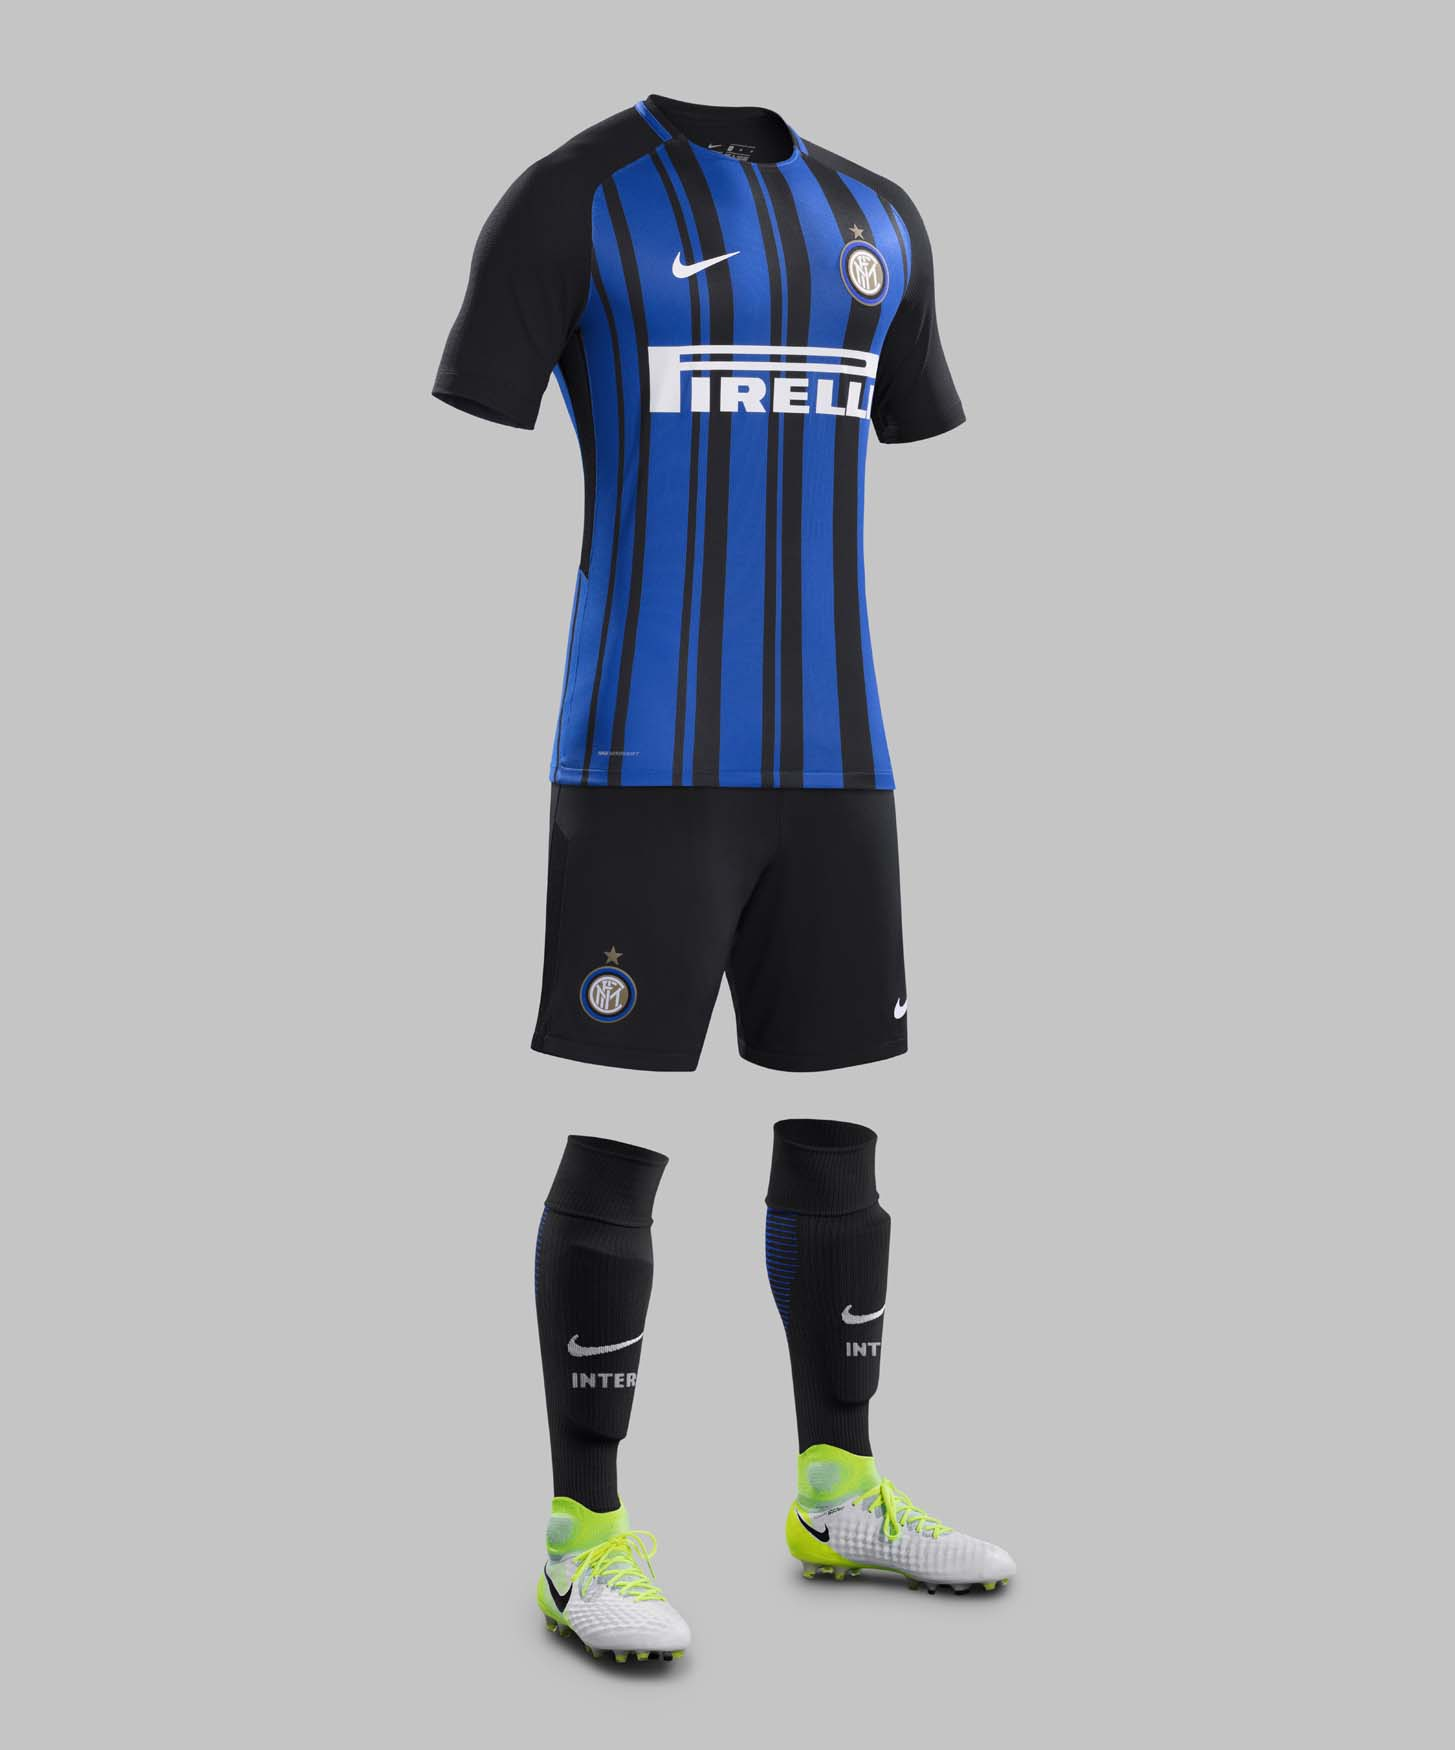 big sale 6f5af 9d55a Inter Milan 2017/18 Nike Home Shirt - SoccerBible